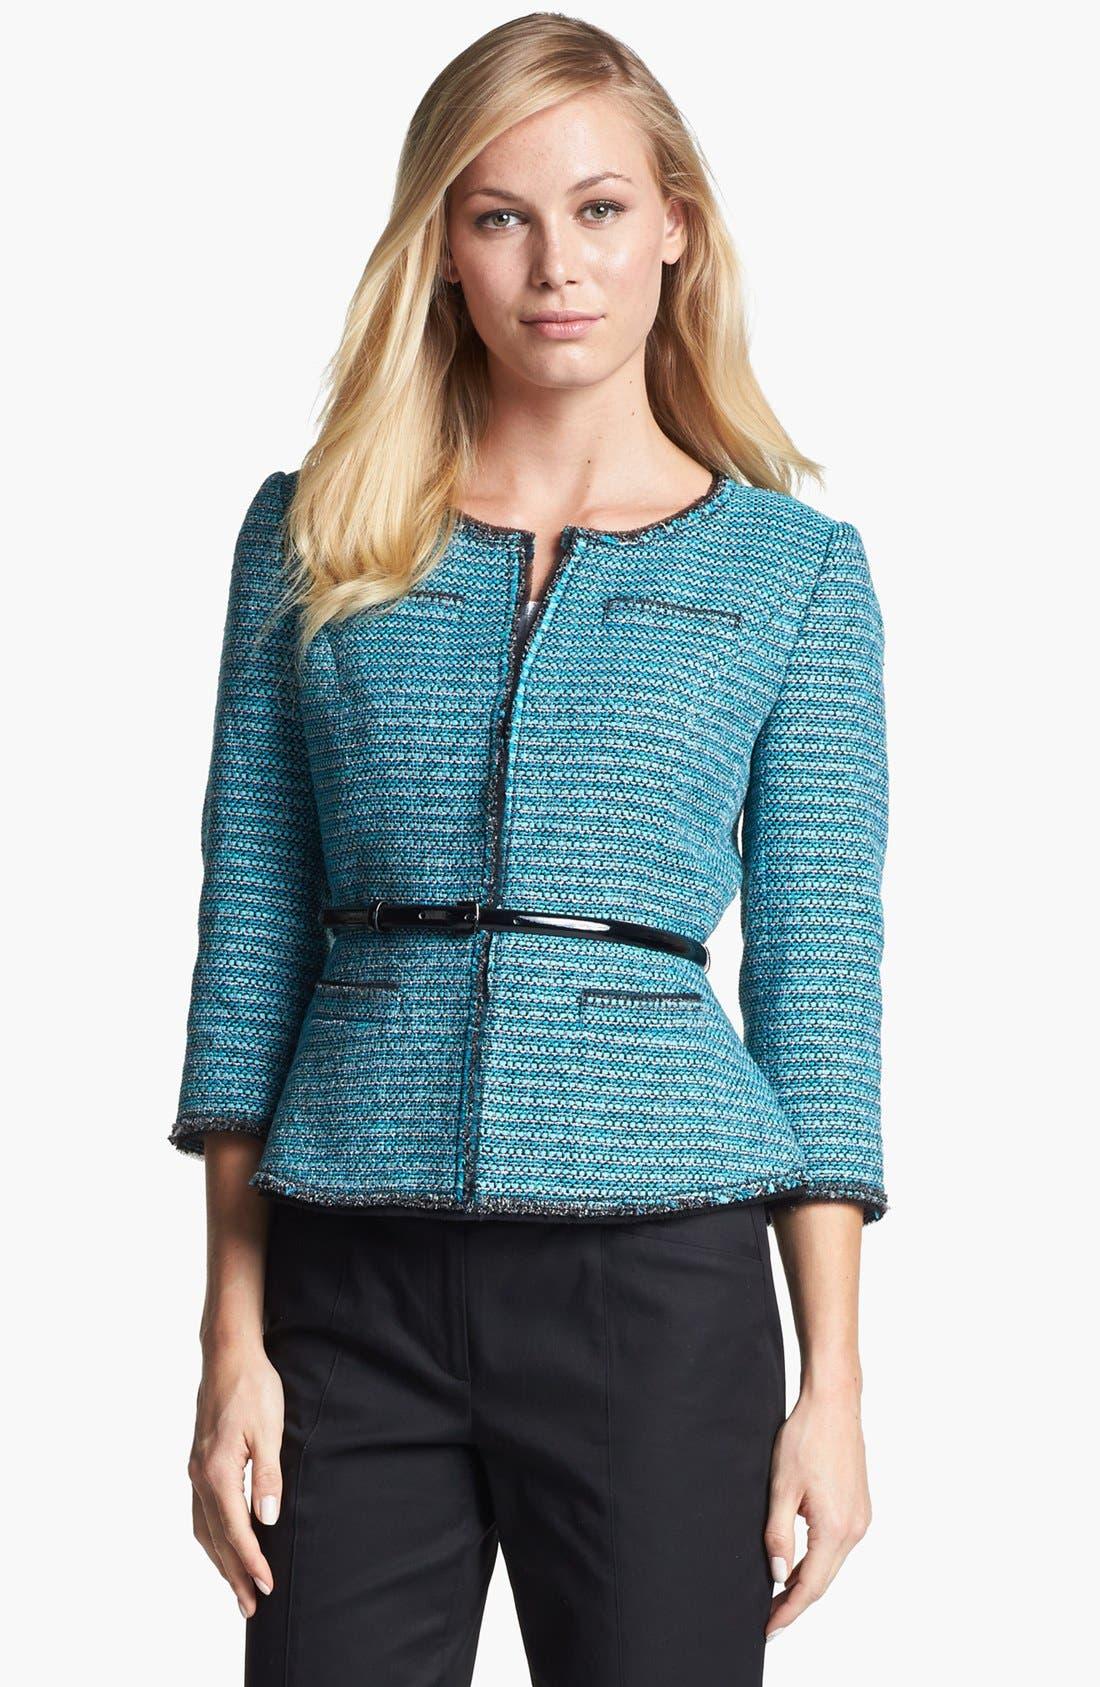 Alternate Image 1 Selected - Classiques Entier® 'Adona' Tweed Jacket